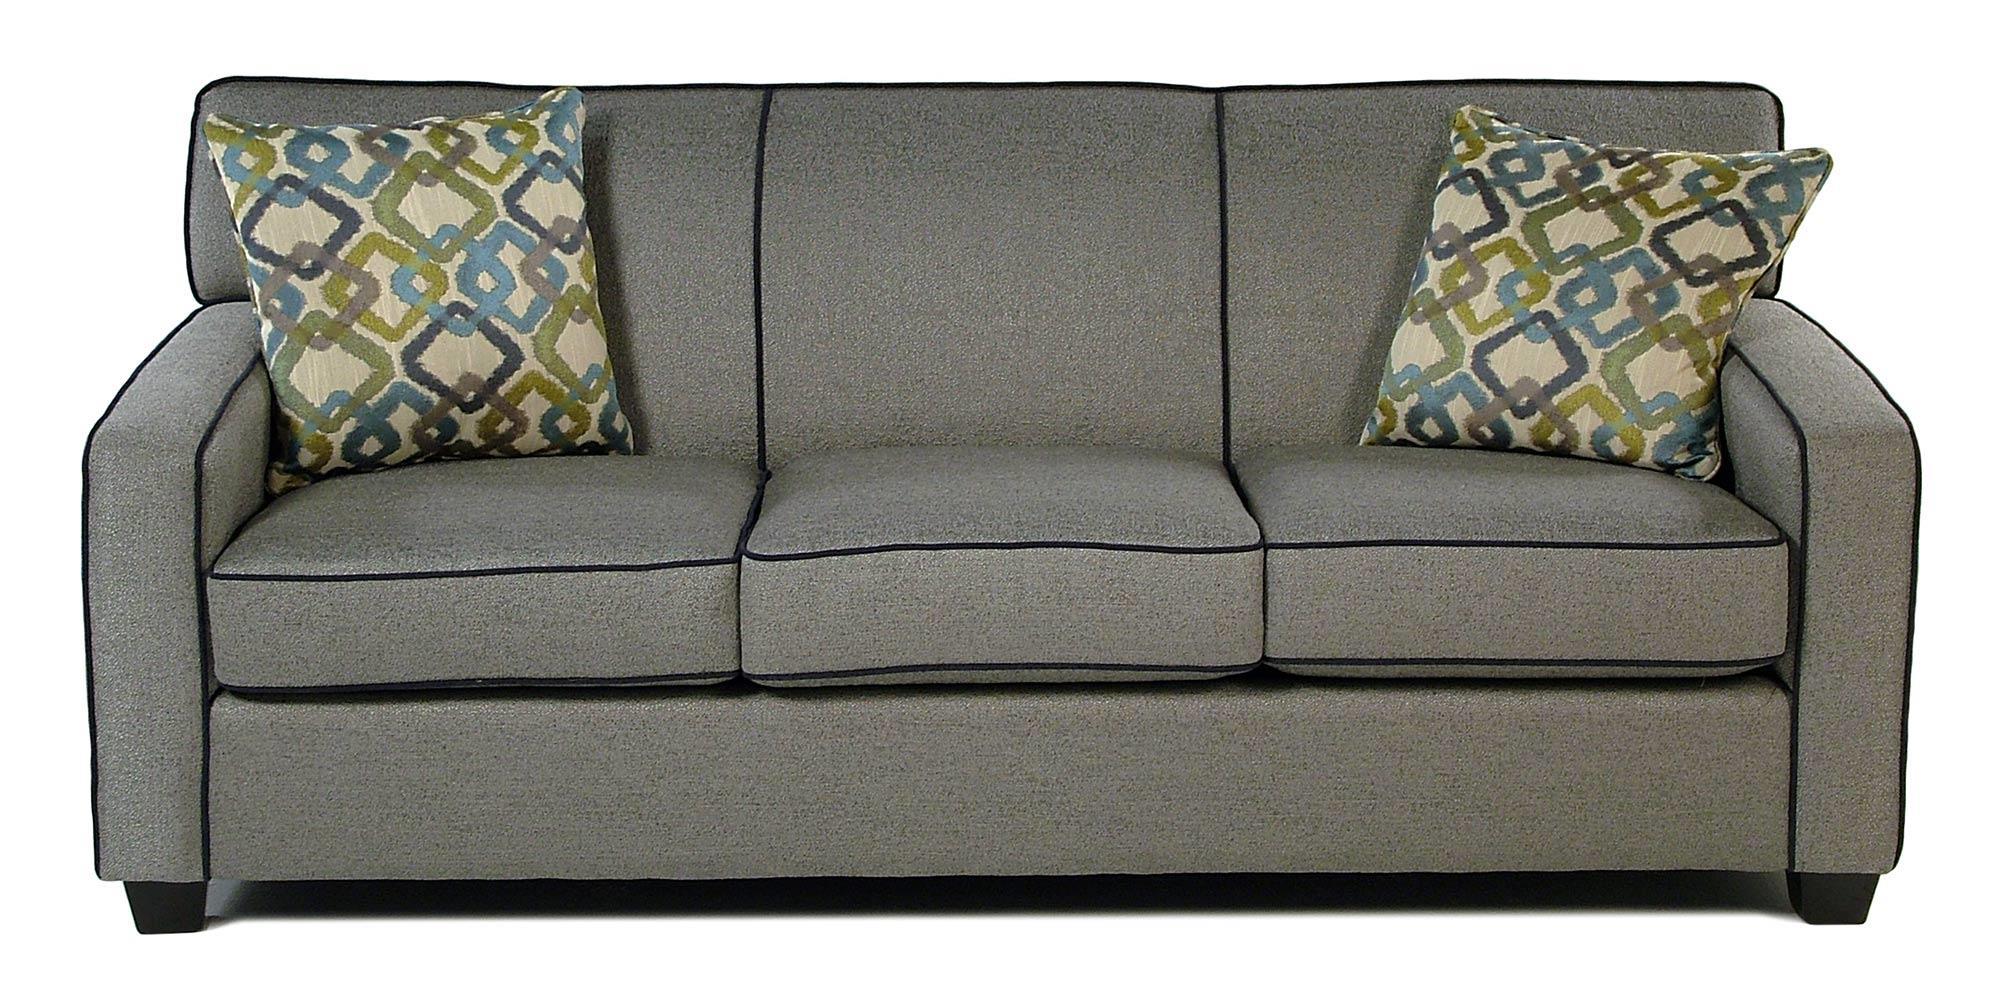 Decor-Rest Gatsby Stationary Sofa - Item Number: 2401S